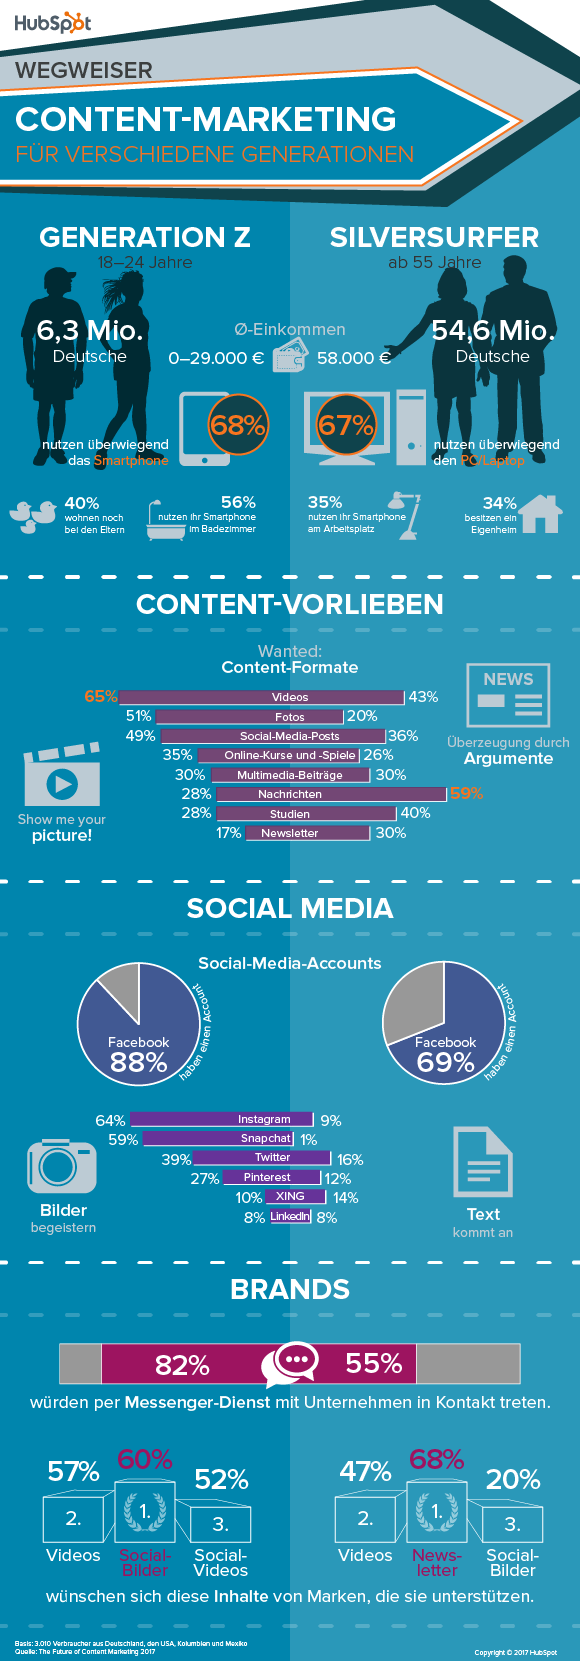 Infografik Social Media Zielgruppen Nutzung (Bild: Hubspot)